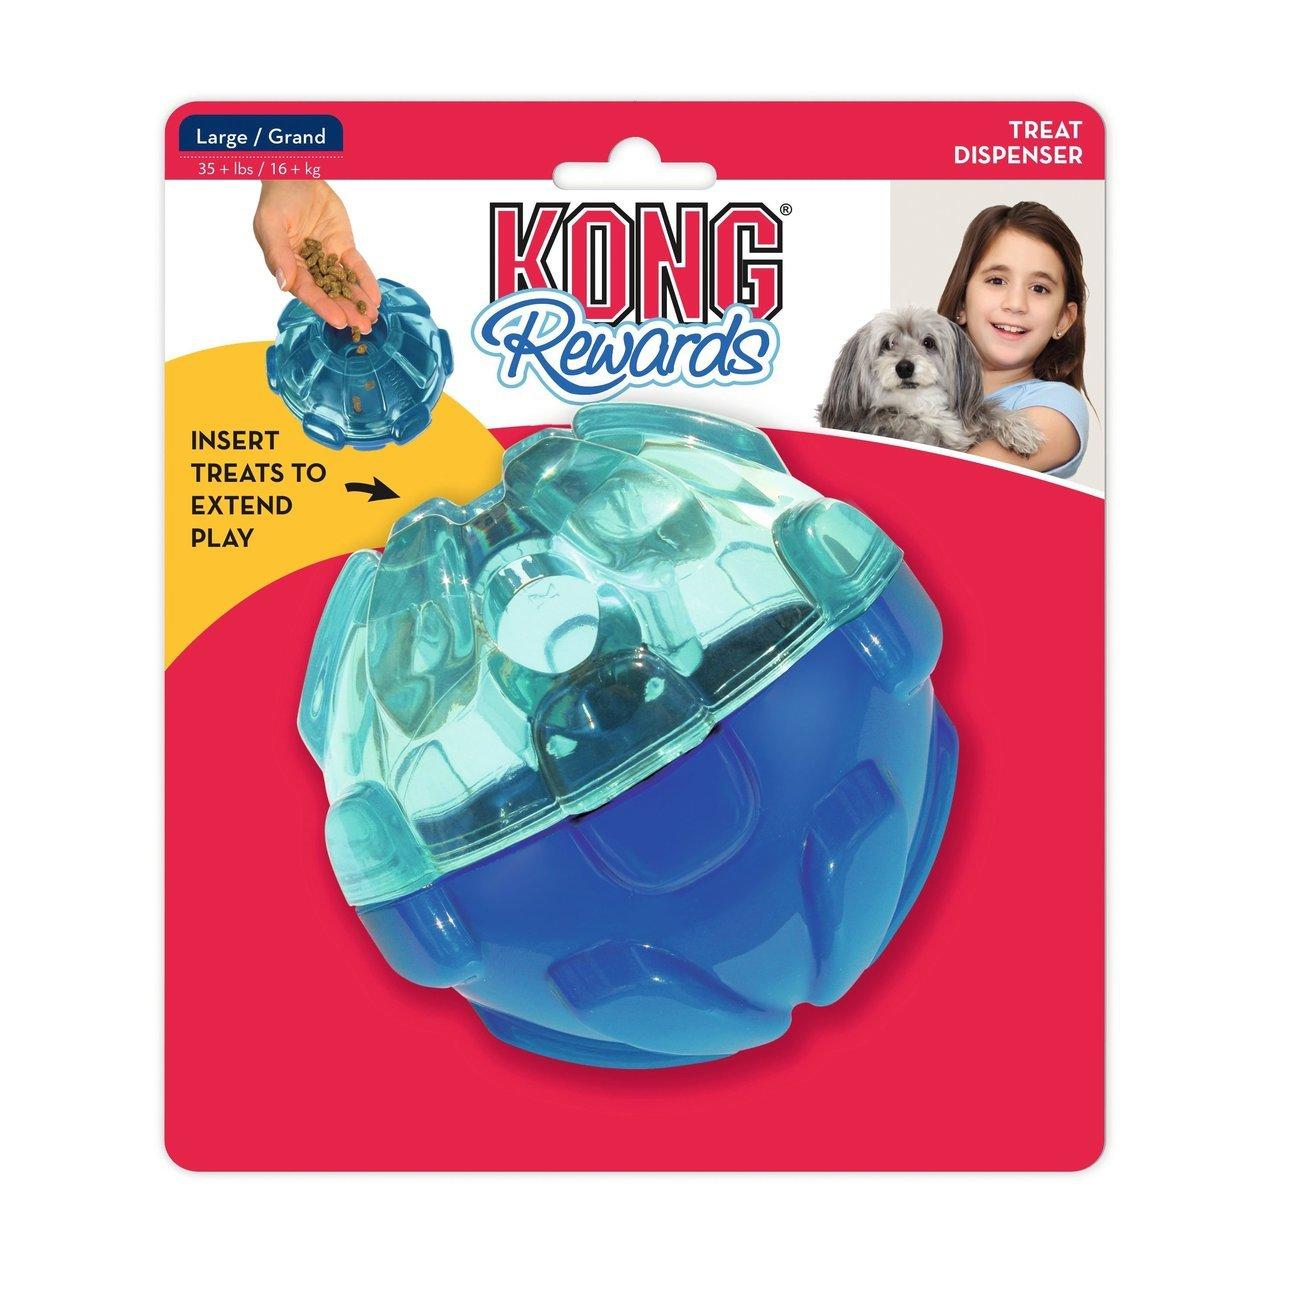 KONG Hundespielzeug Rewards Ball, Bild 2